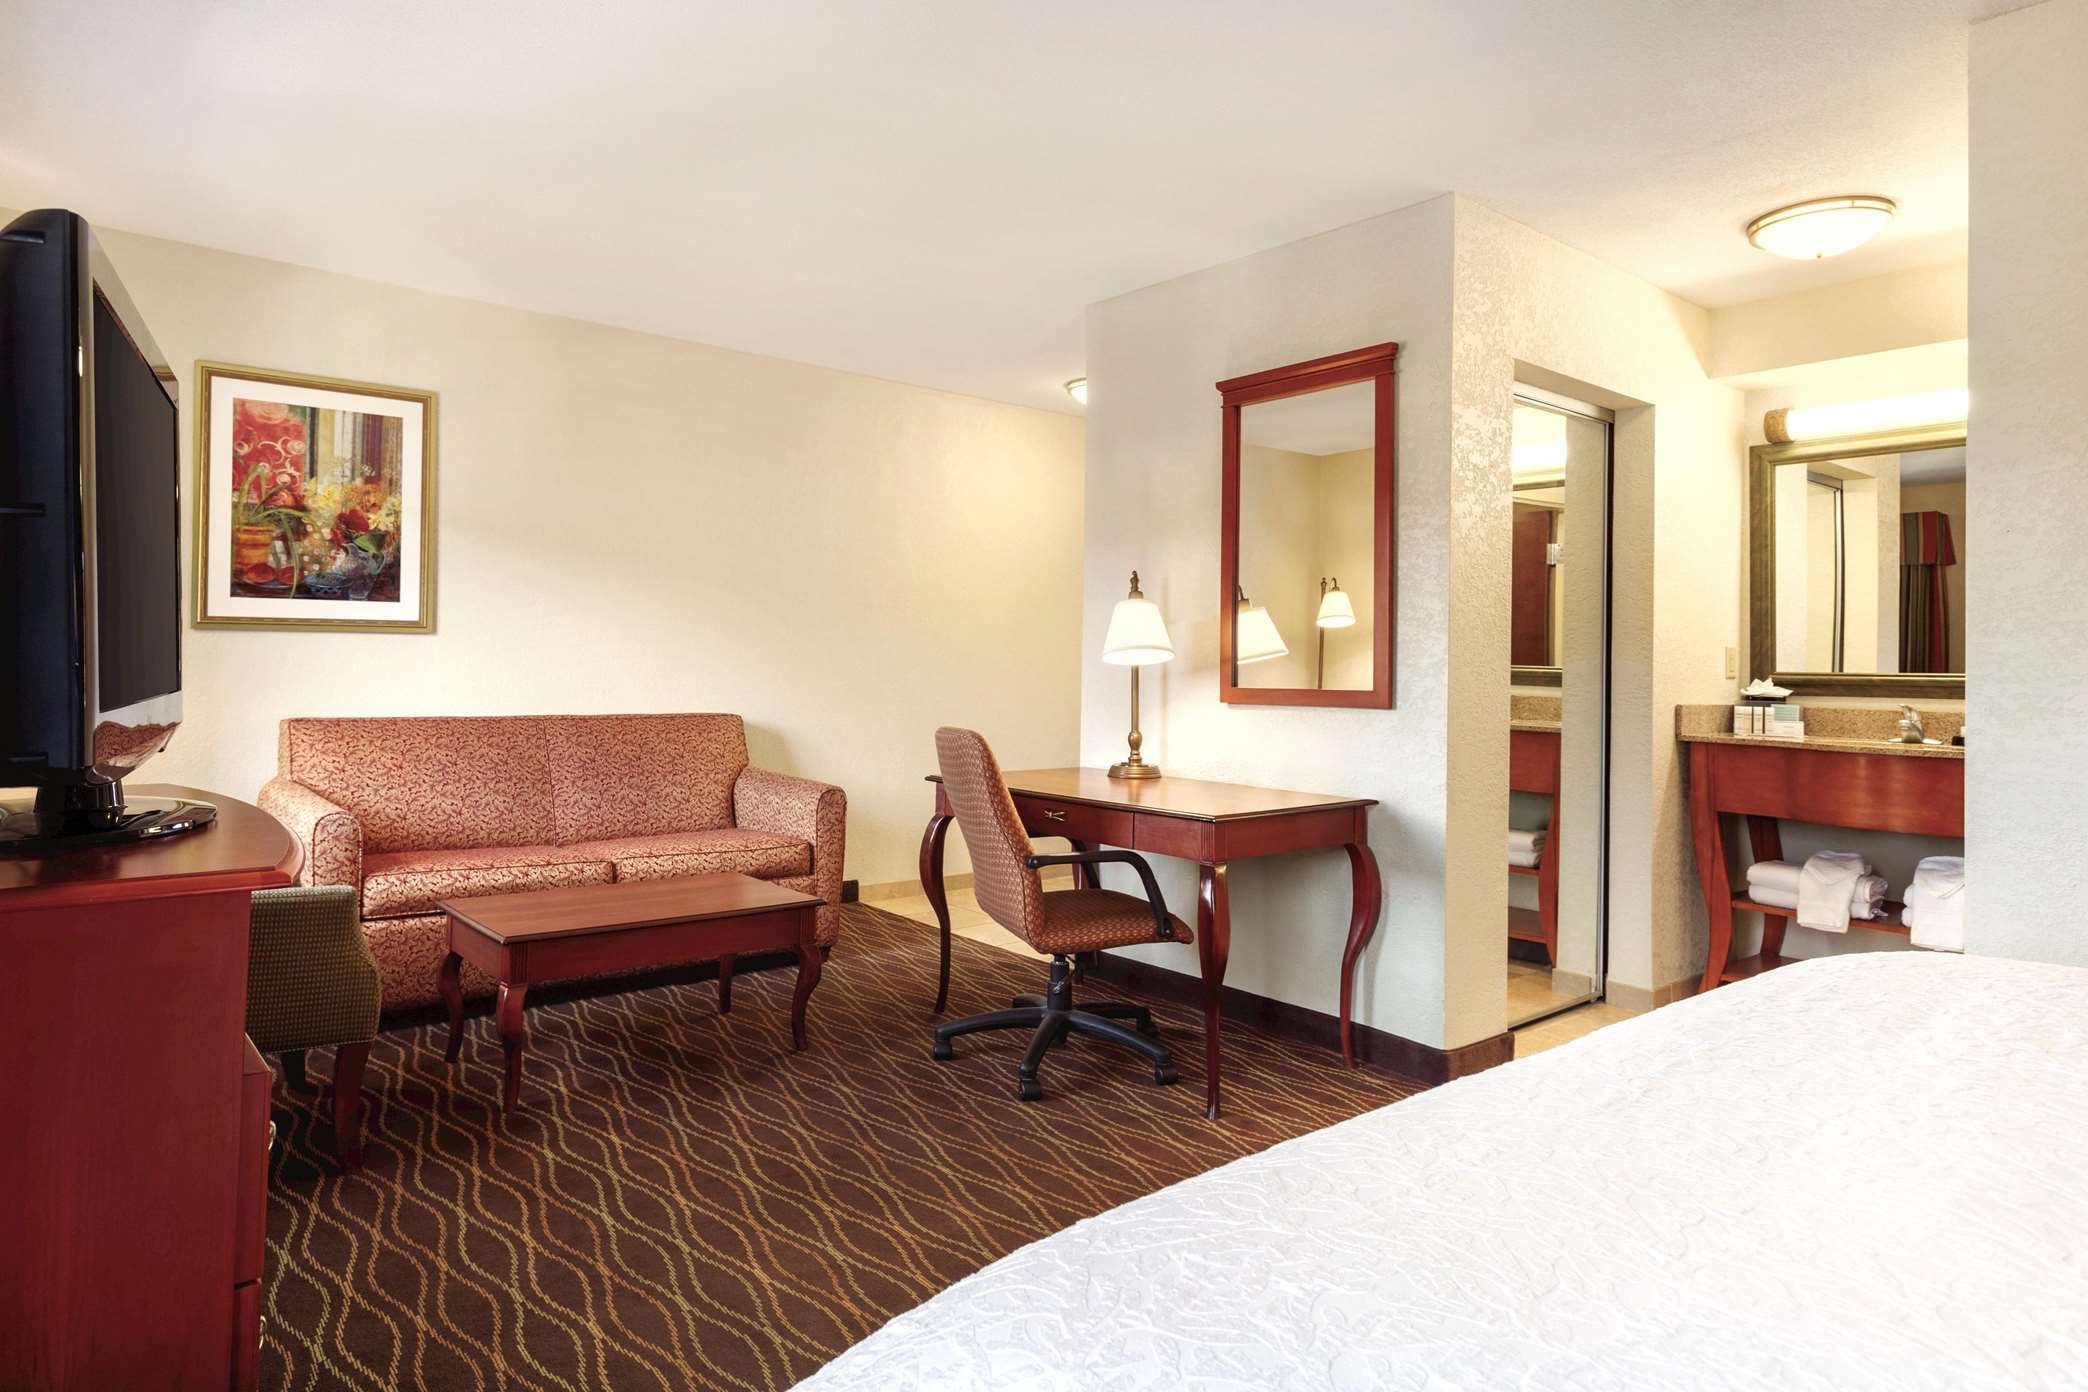 Hampton Inn & Suites Greenfield image 35